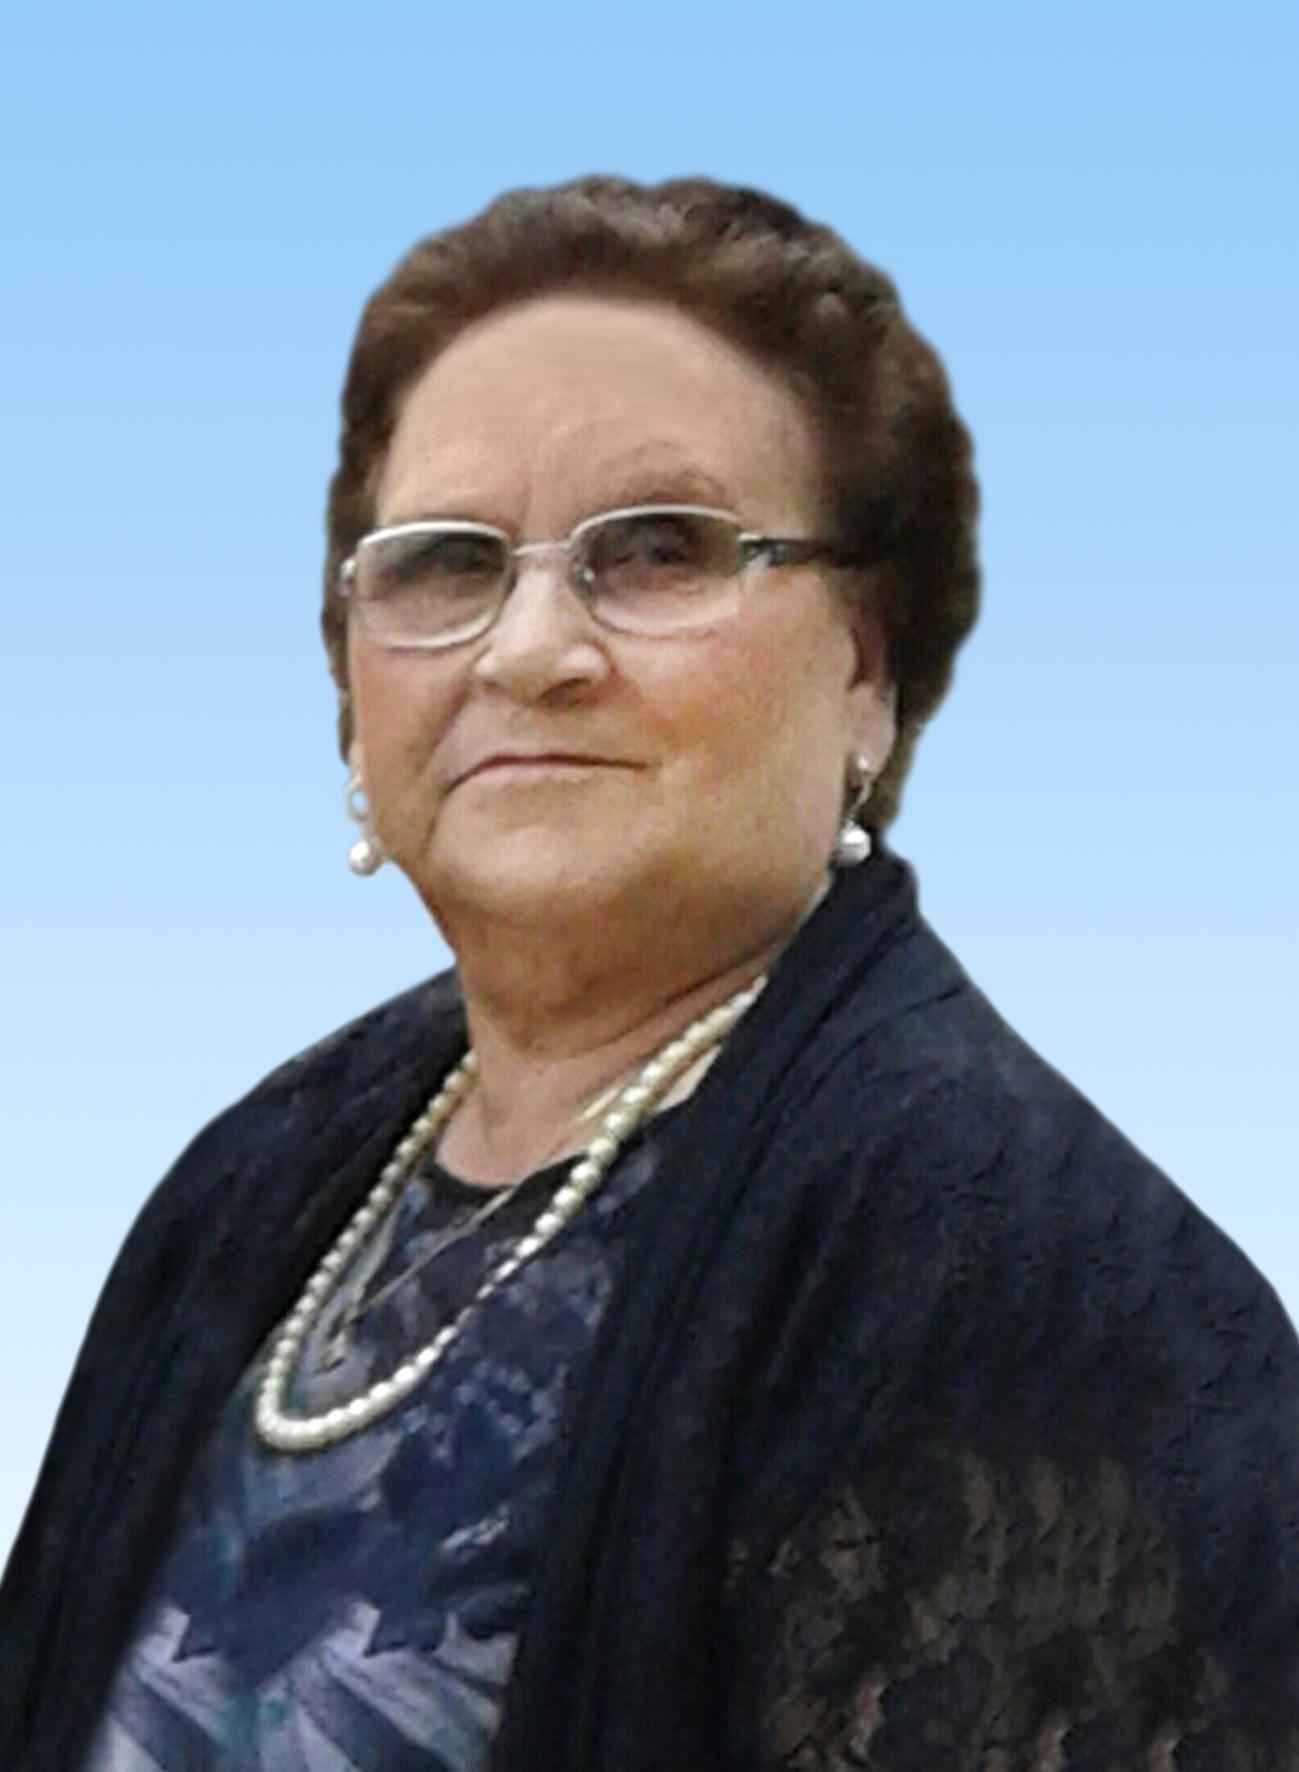 CIRRUTO MARIA